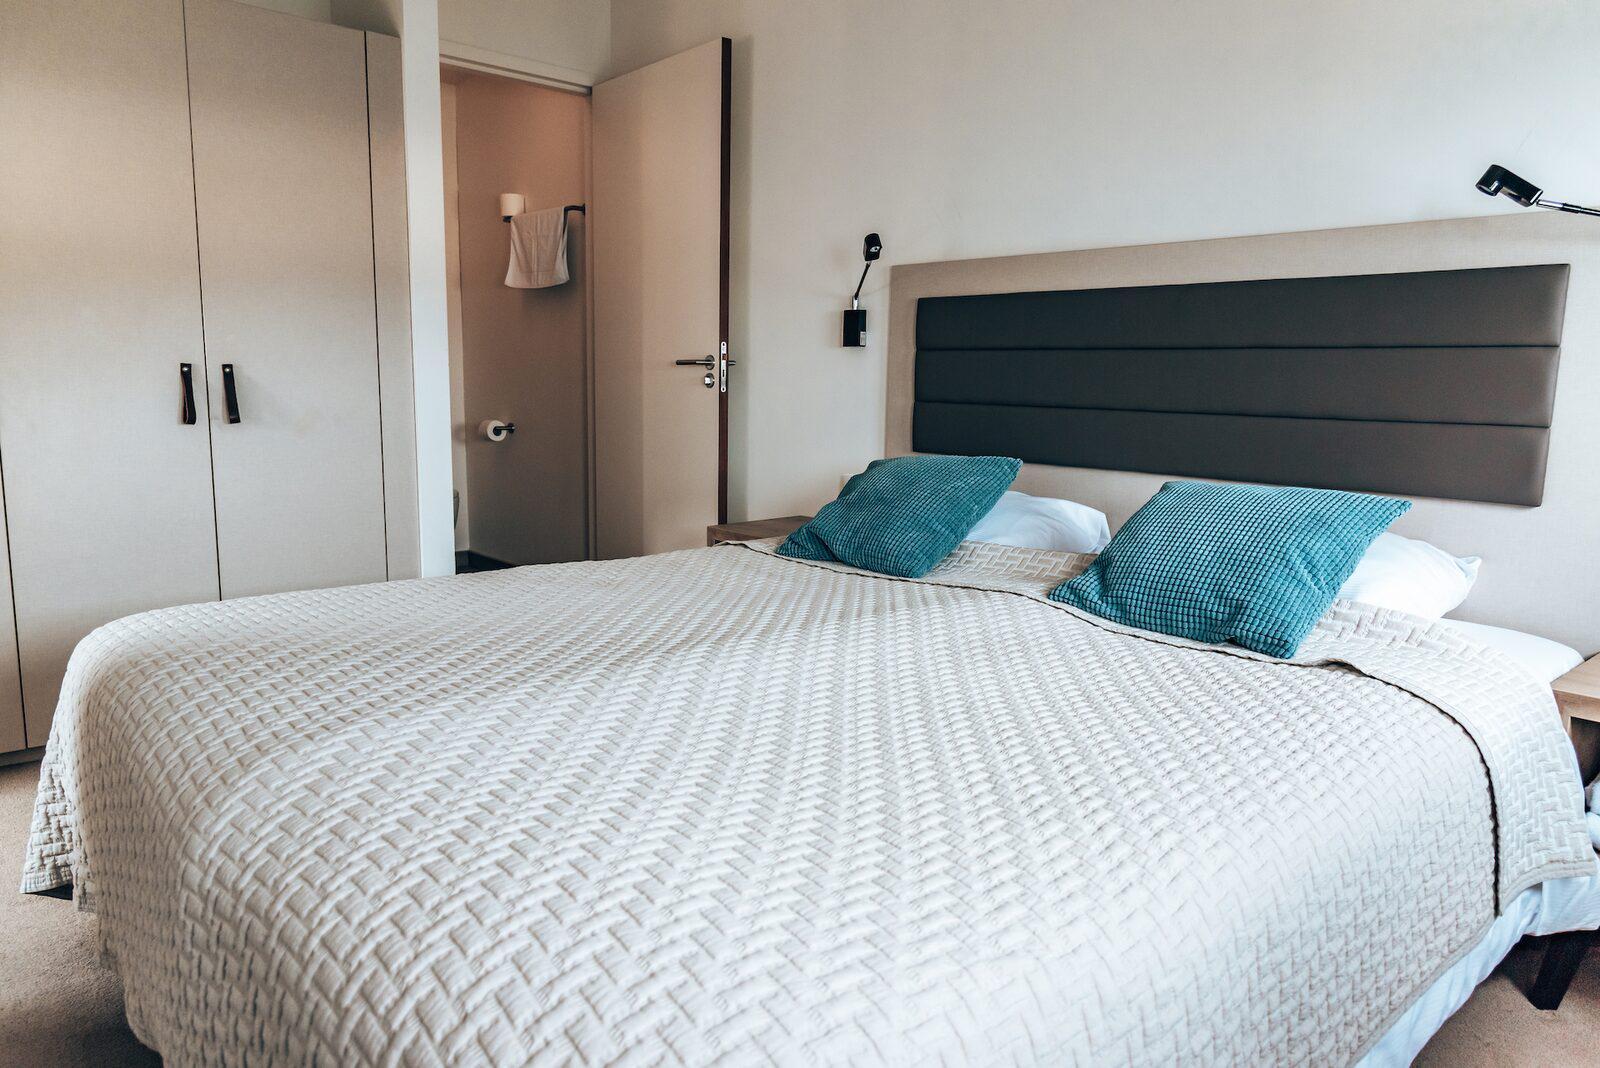 Oasis Parcs Hotelstudio 2 personen Ouddorp Zuid-Holland